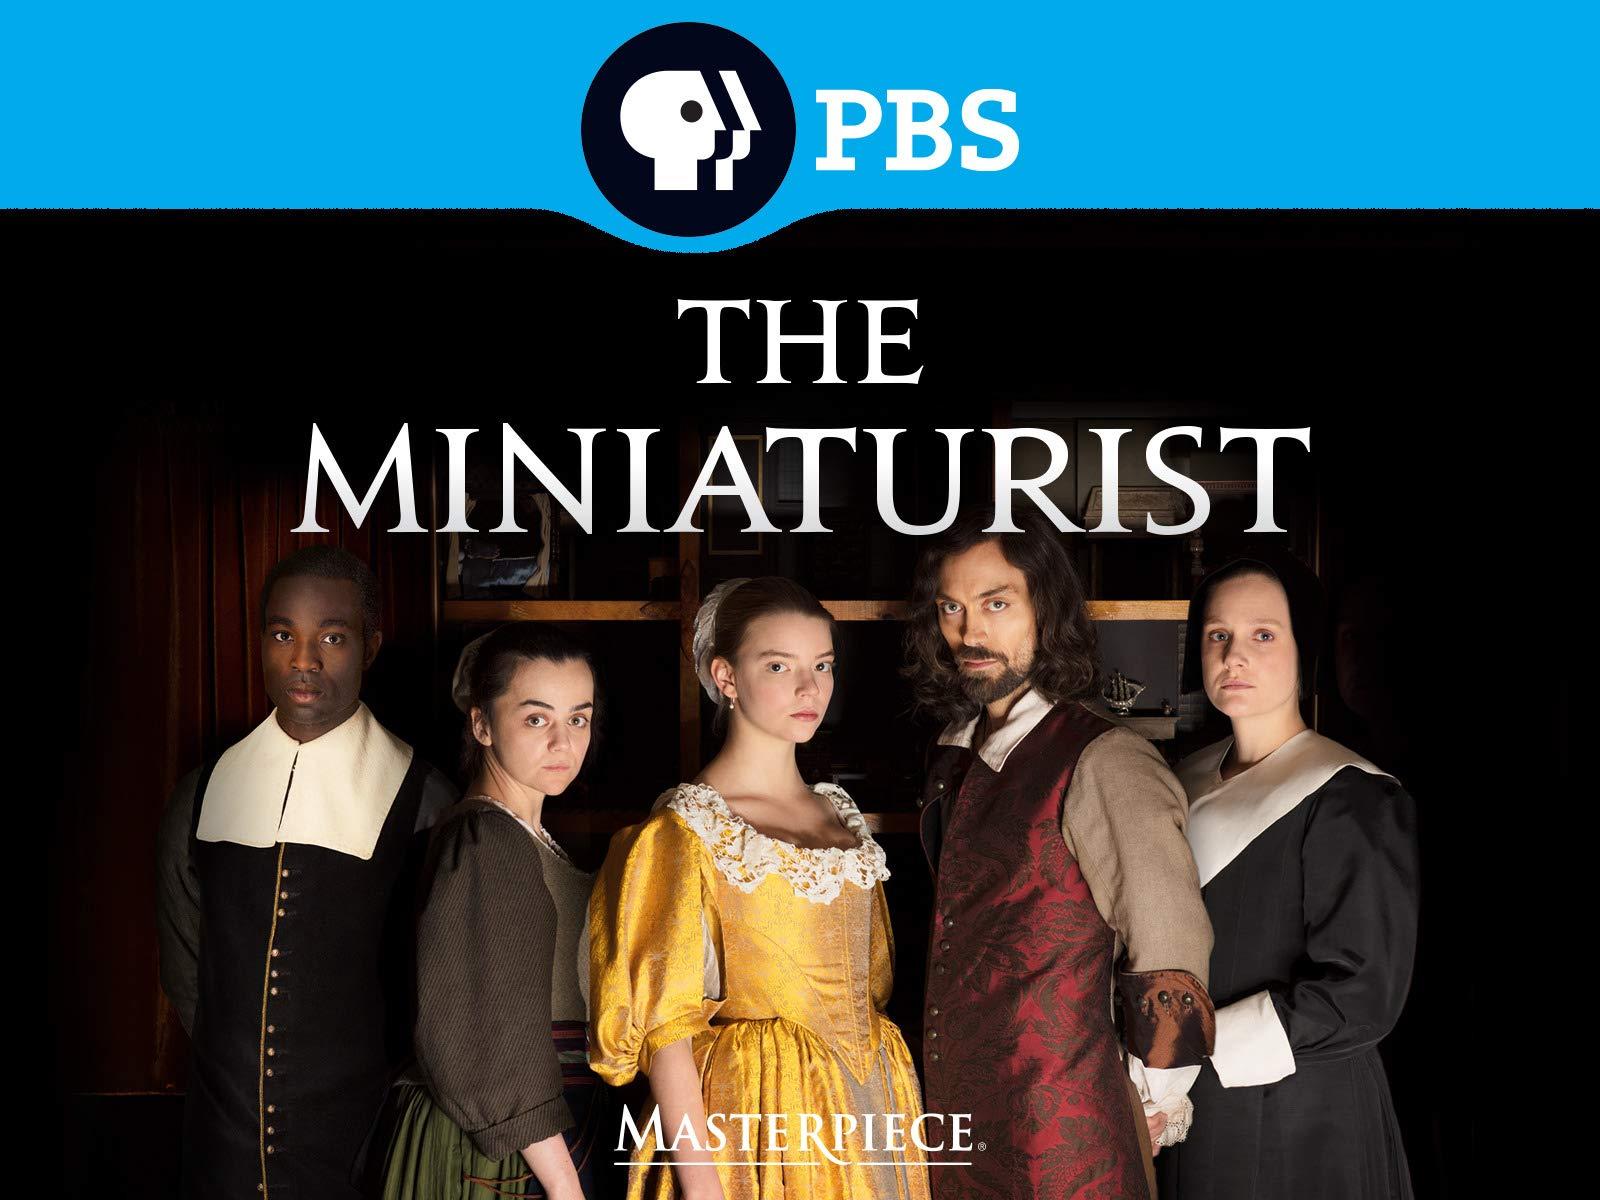 Amazoncom Watch The Miniaturist Season 1 Prime Video